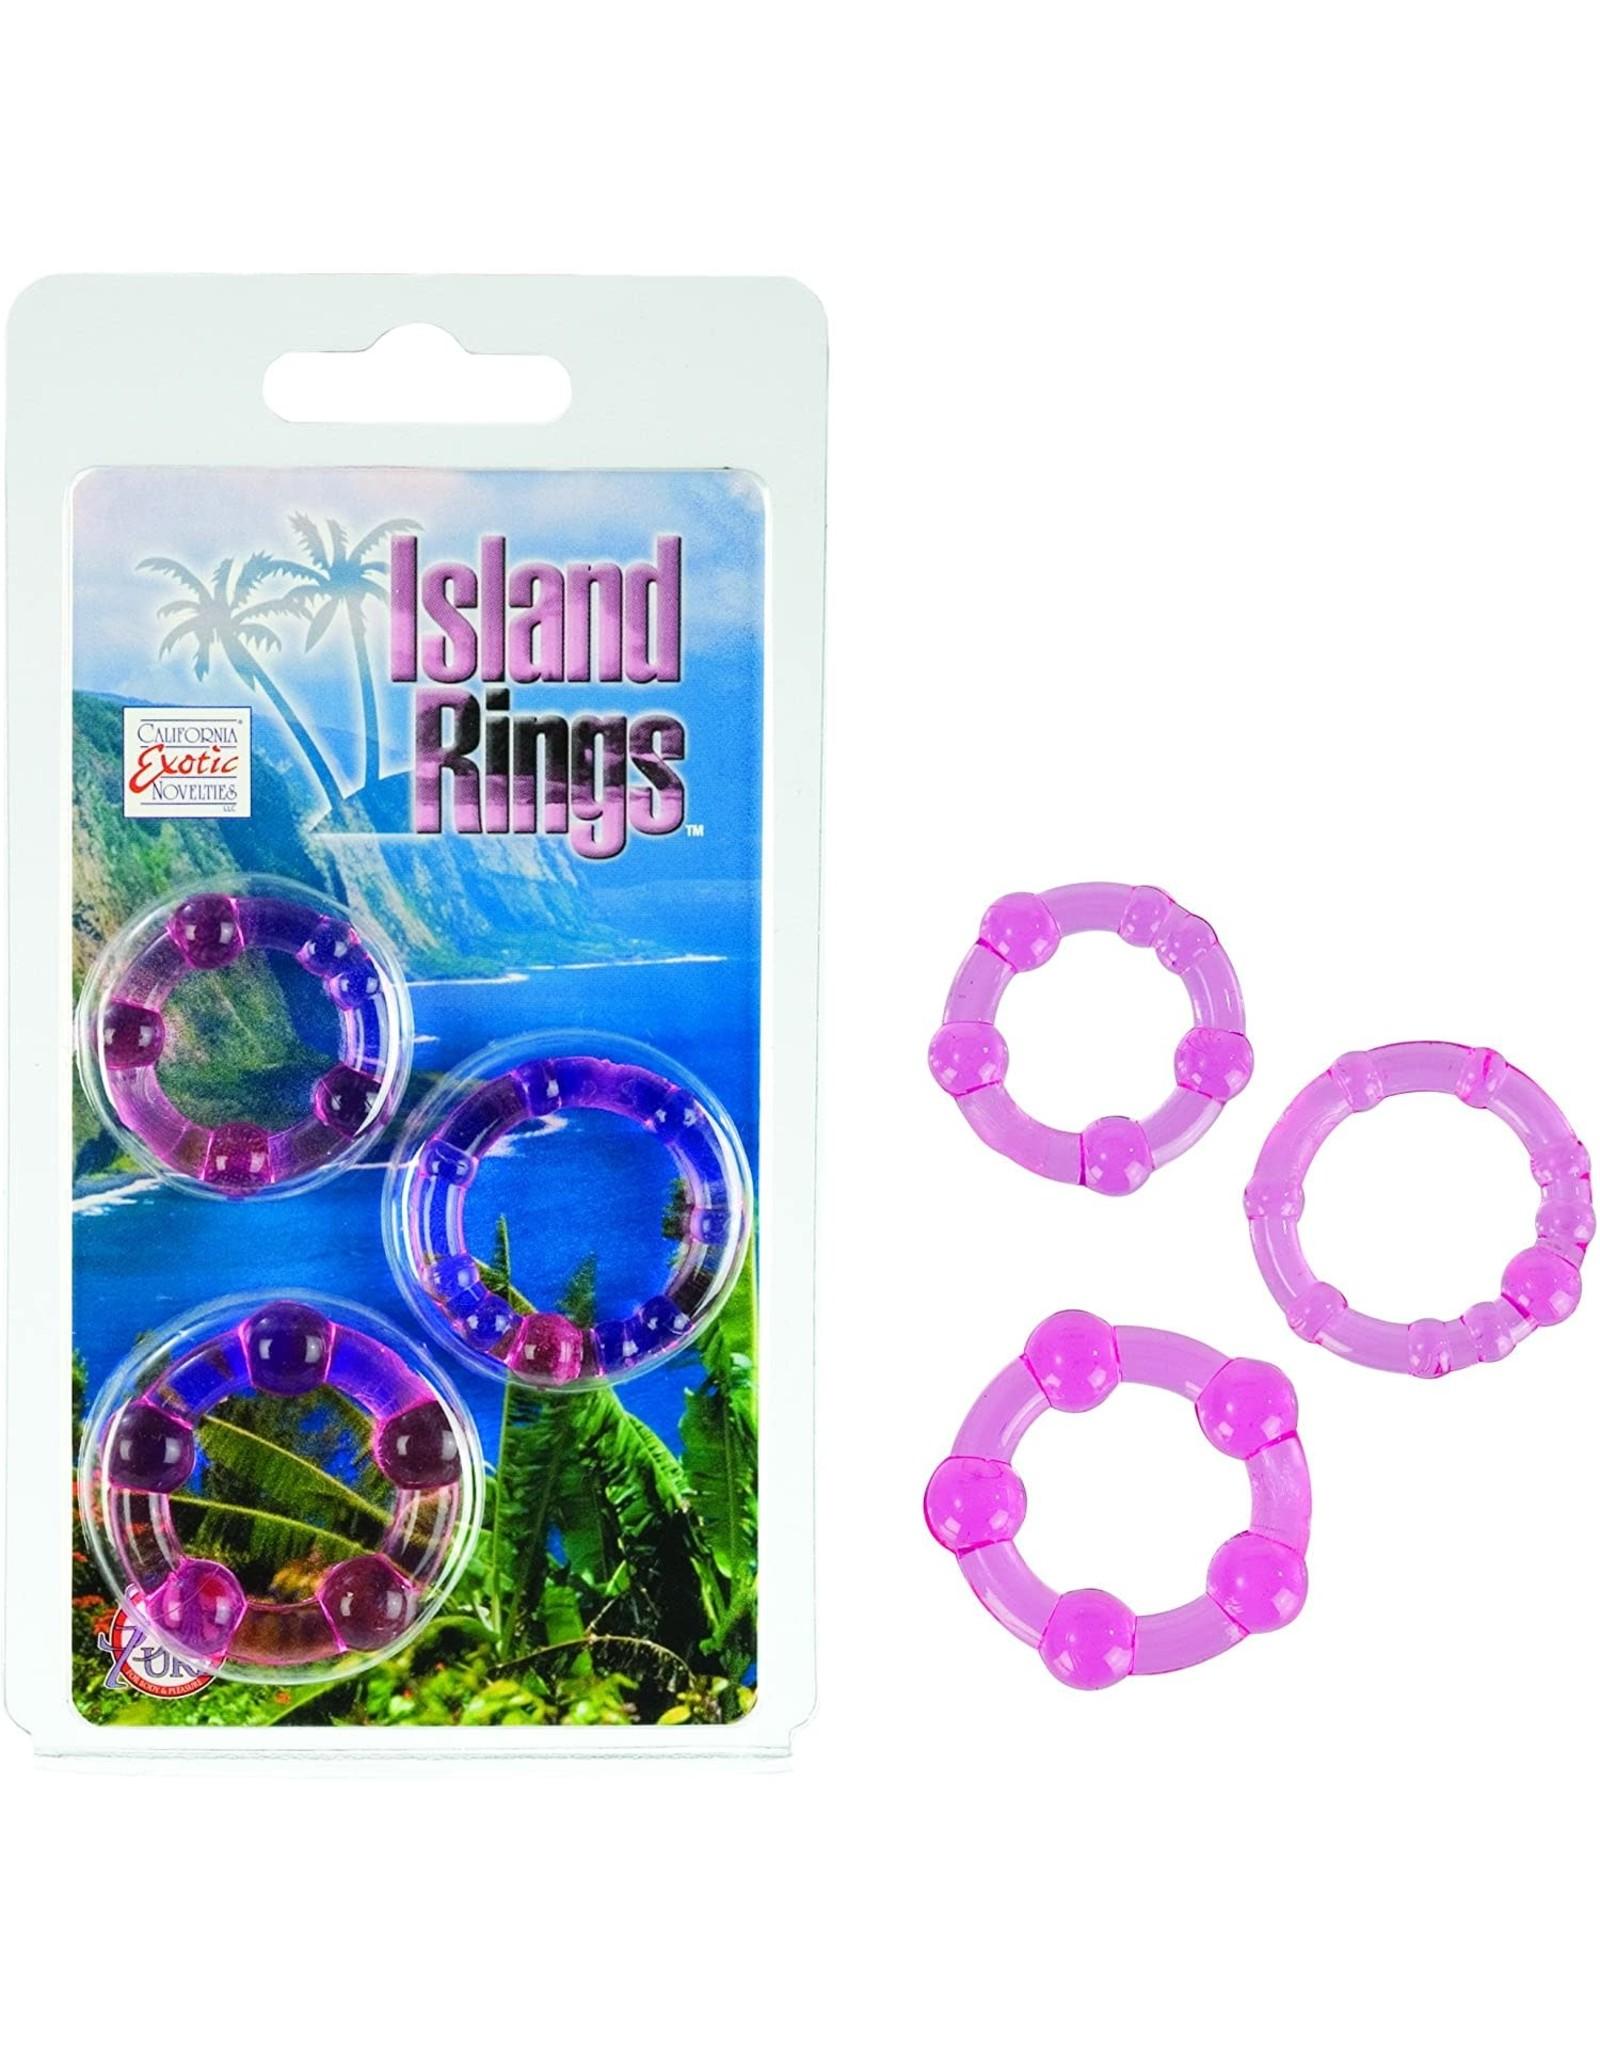 CALEXOTICS - ISLAND RINGS 3 PACK - PINK